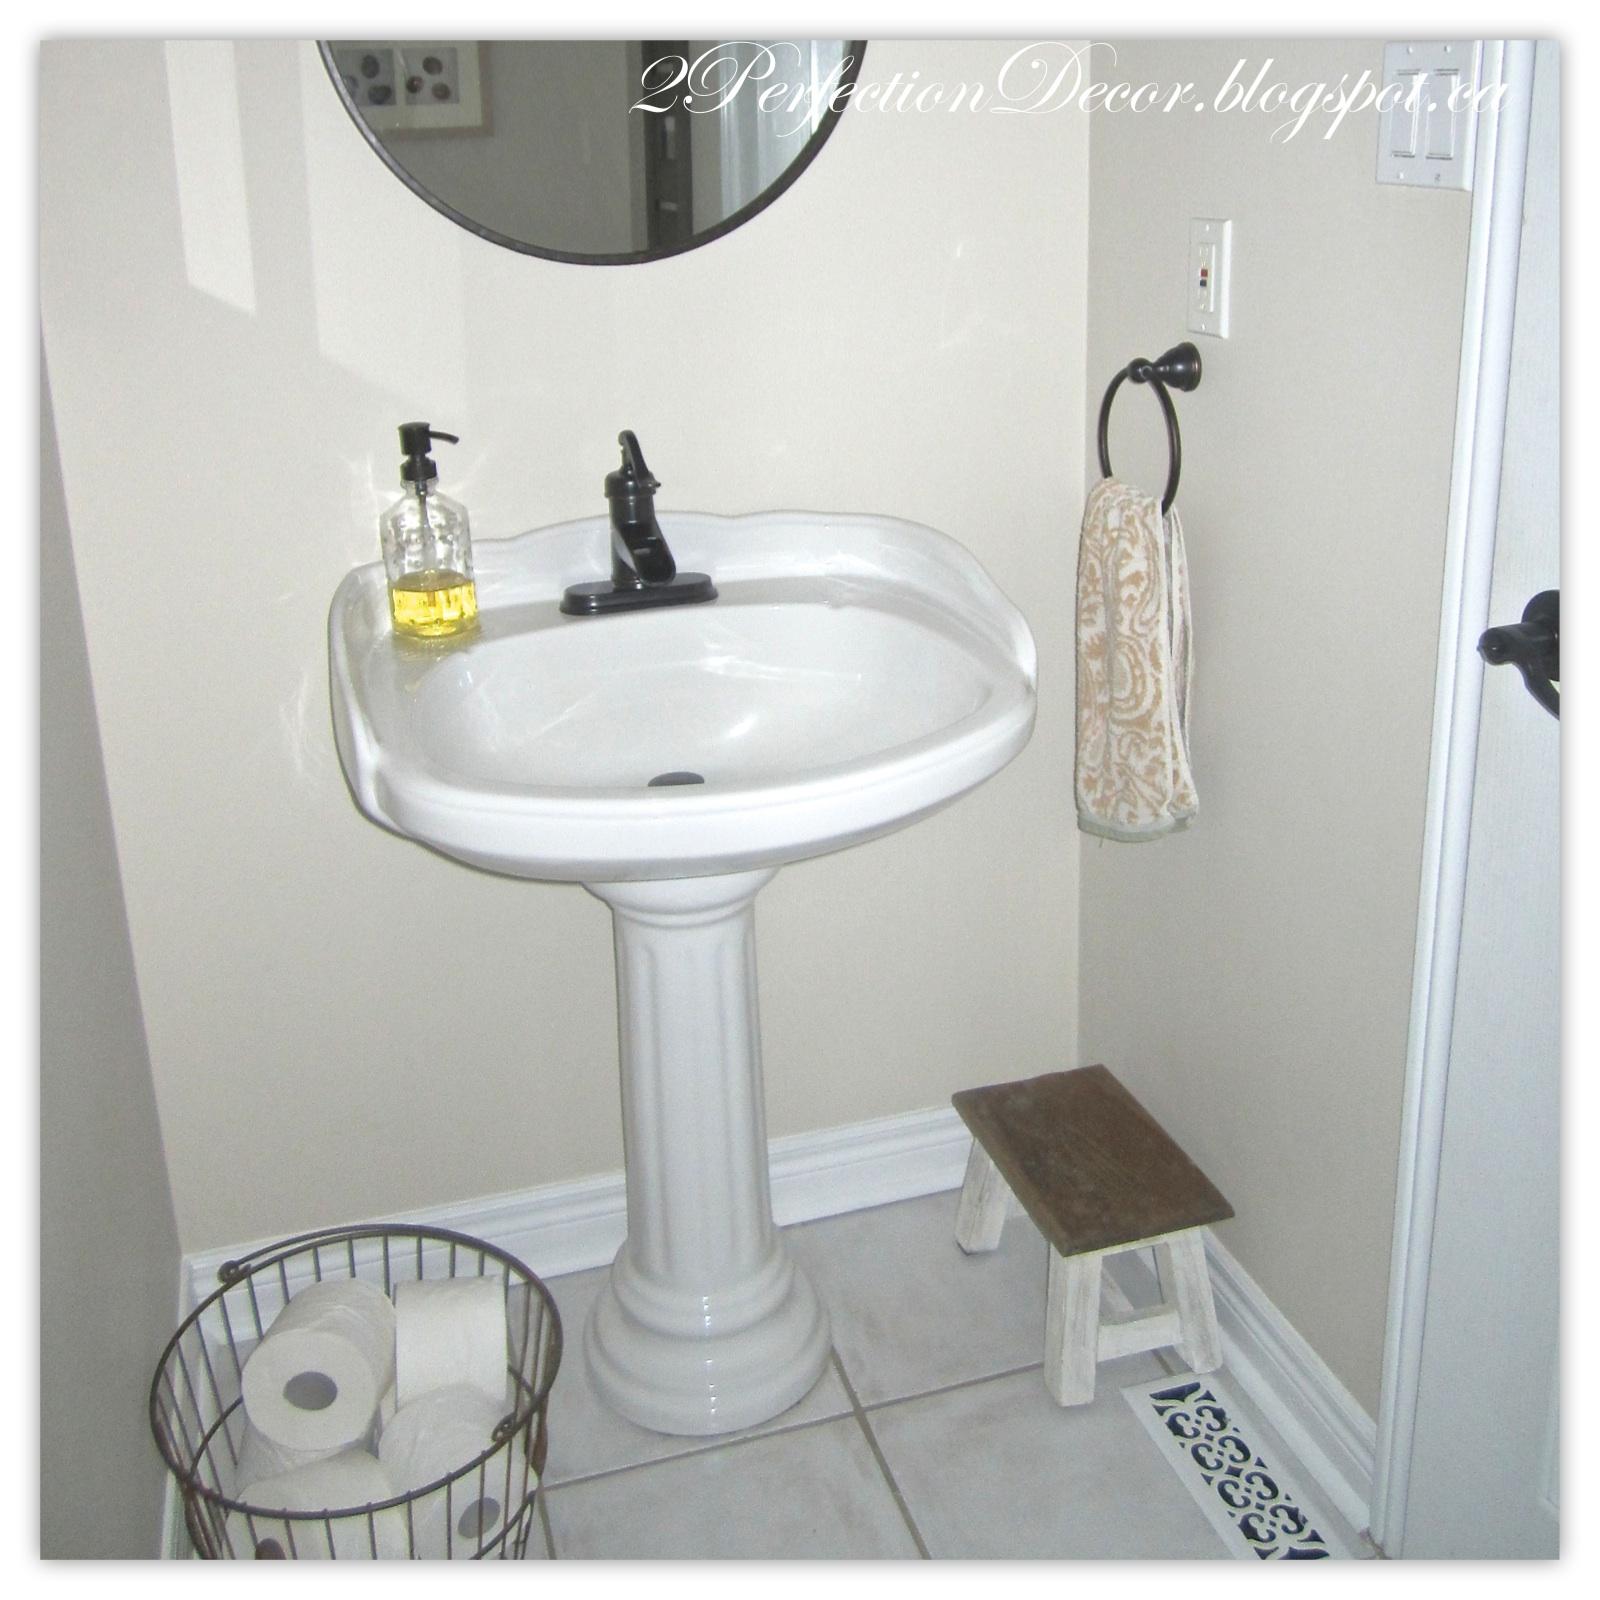 Homesense Bathroom Accessories. Linen Closet With Homesense Bathroom ...